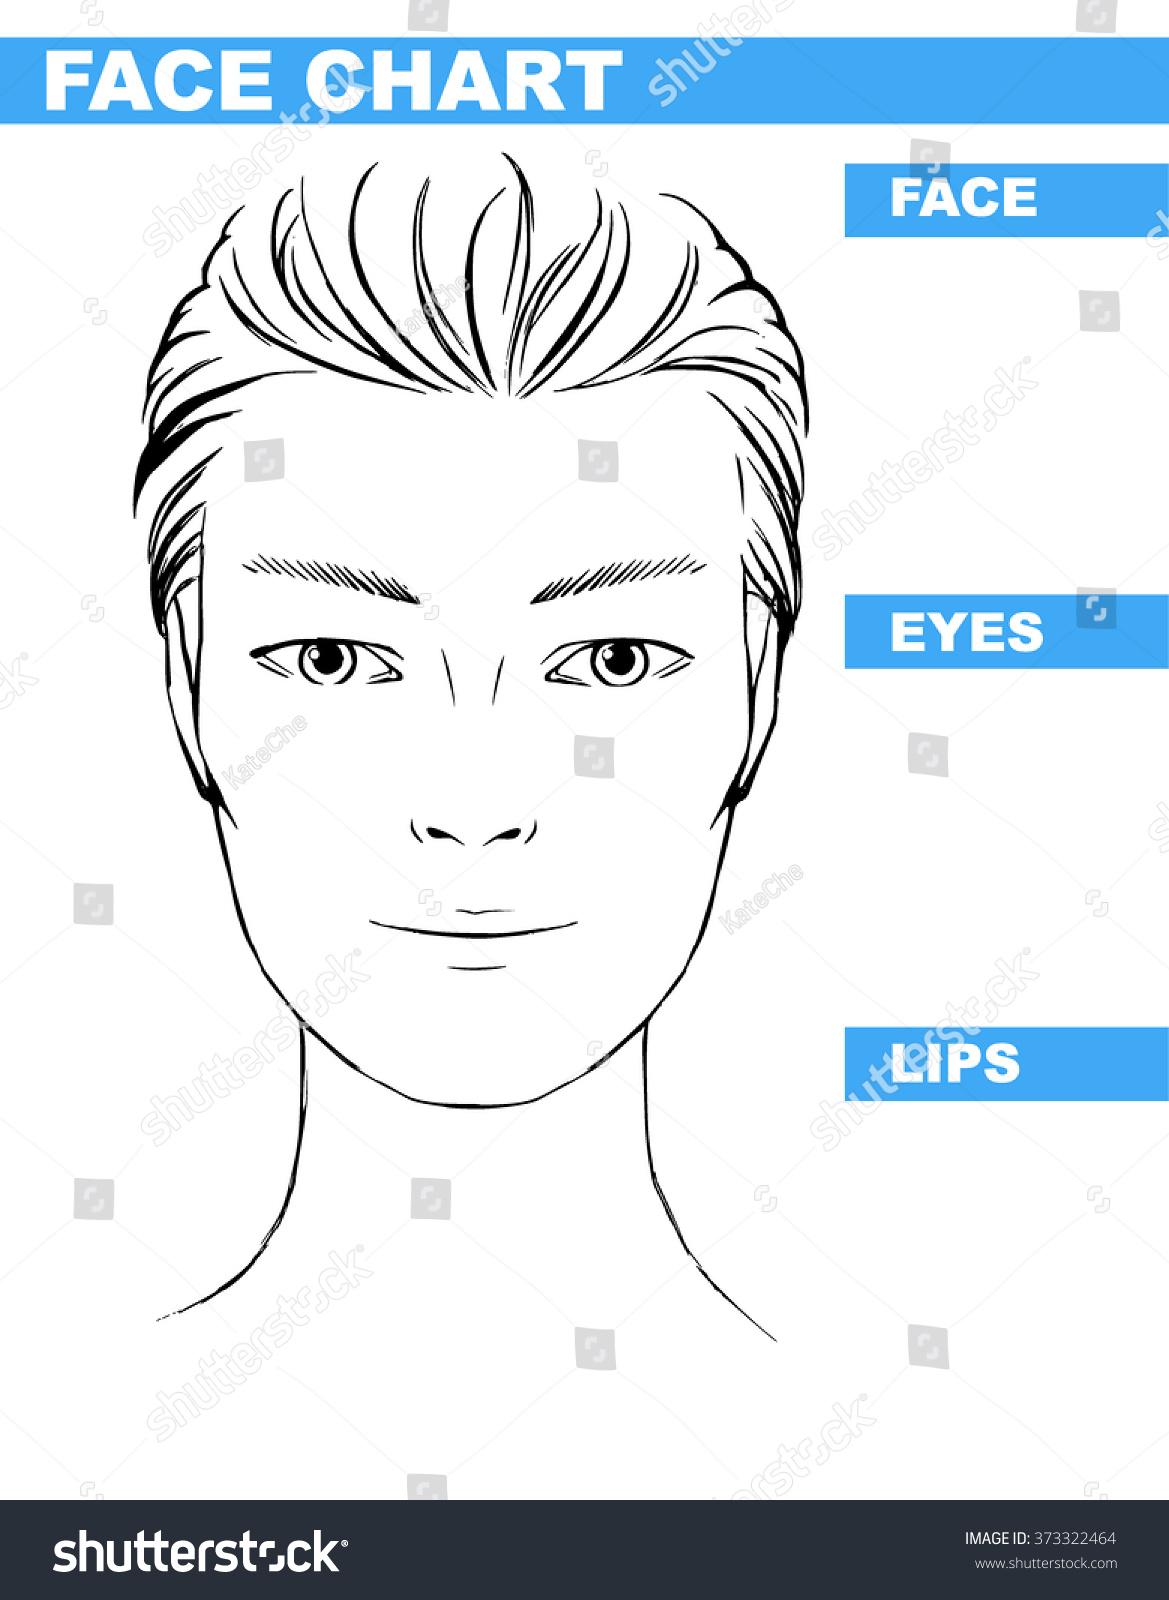 Close Femalemale Hooded Eyesasian Portrait Makeup Stock Vector 373322464 - Shutterstock